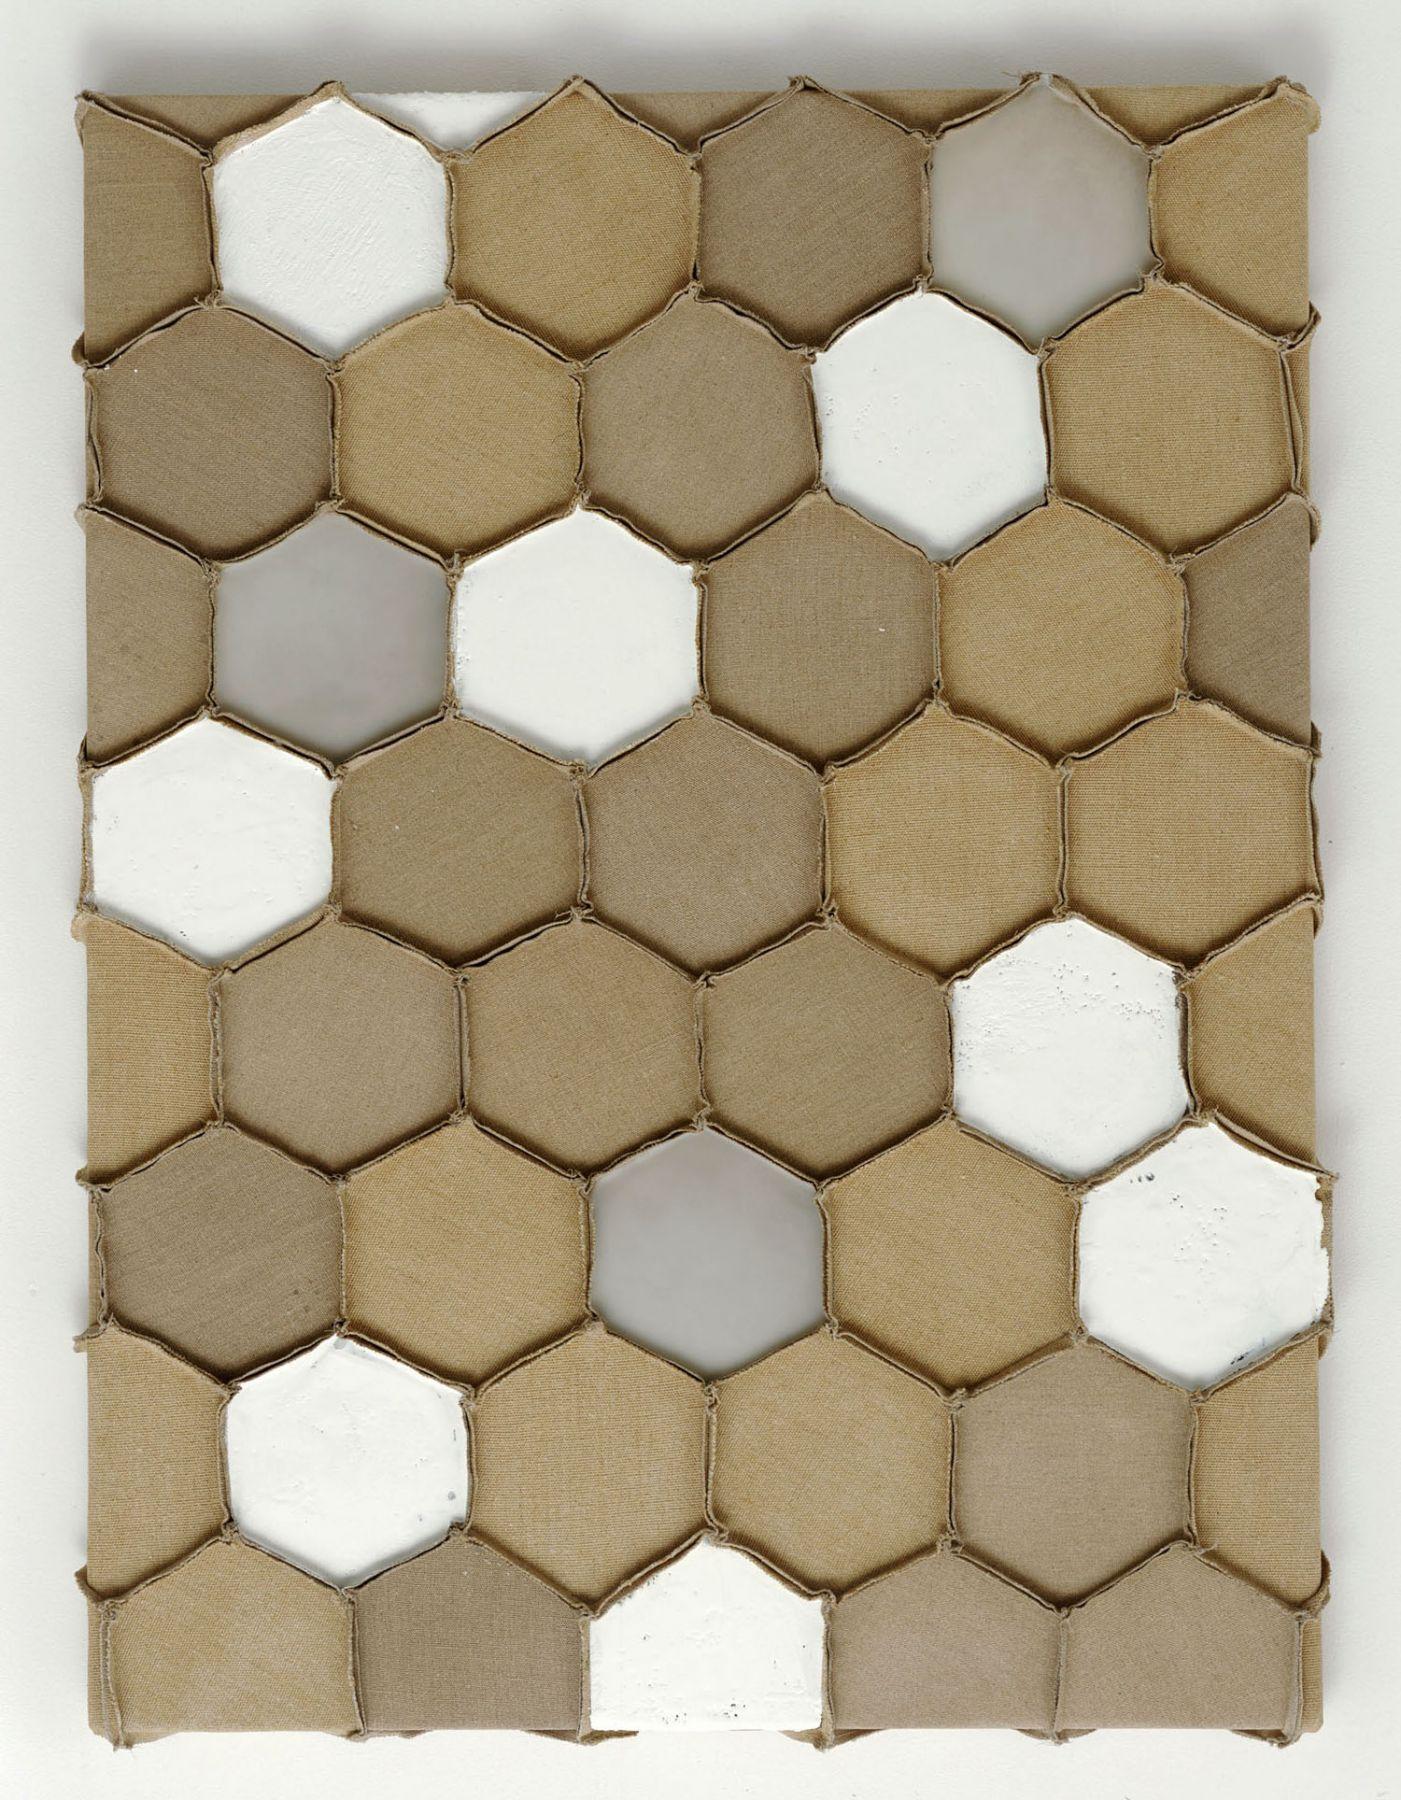 bee's nest pattern by donald moffett